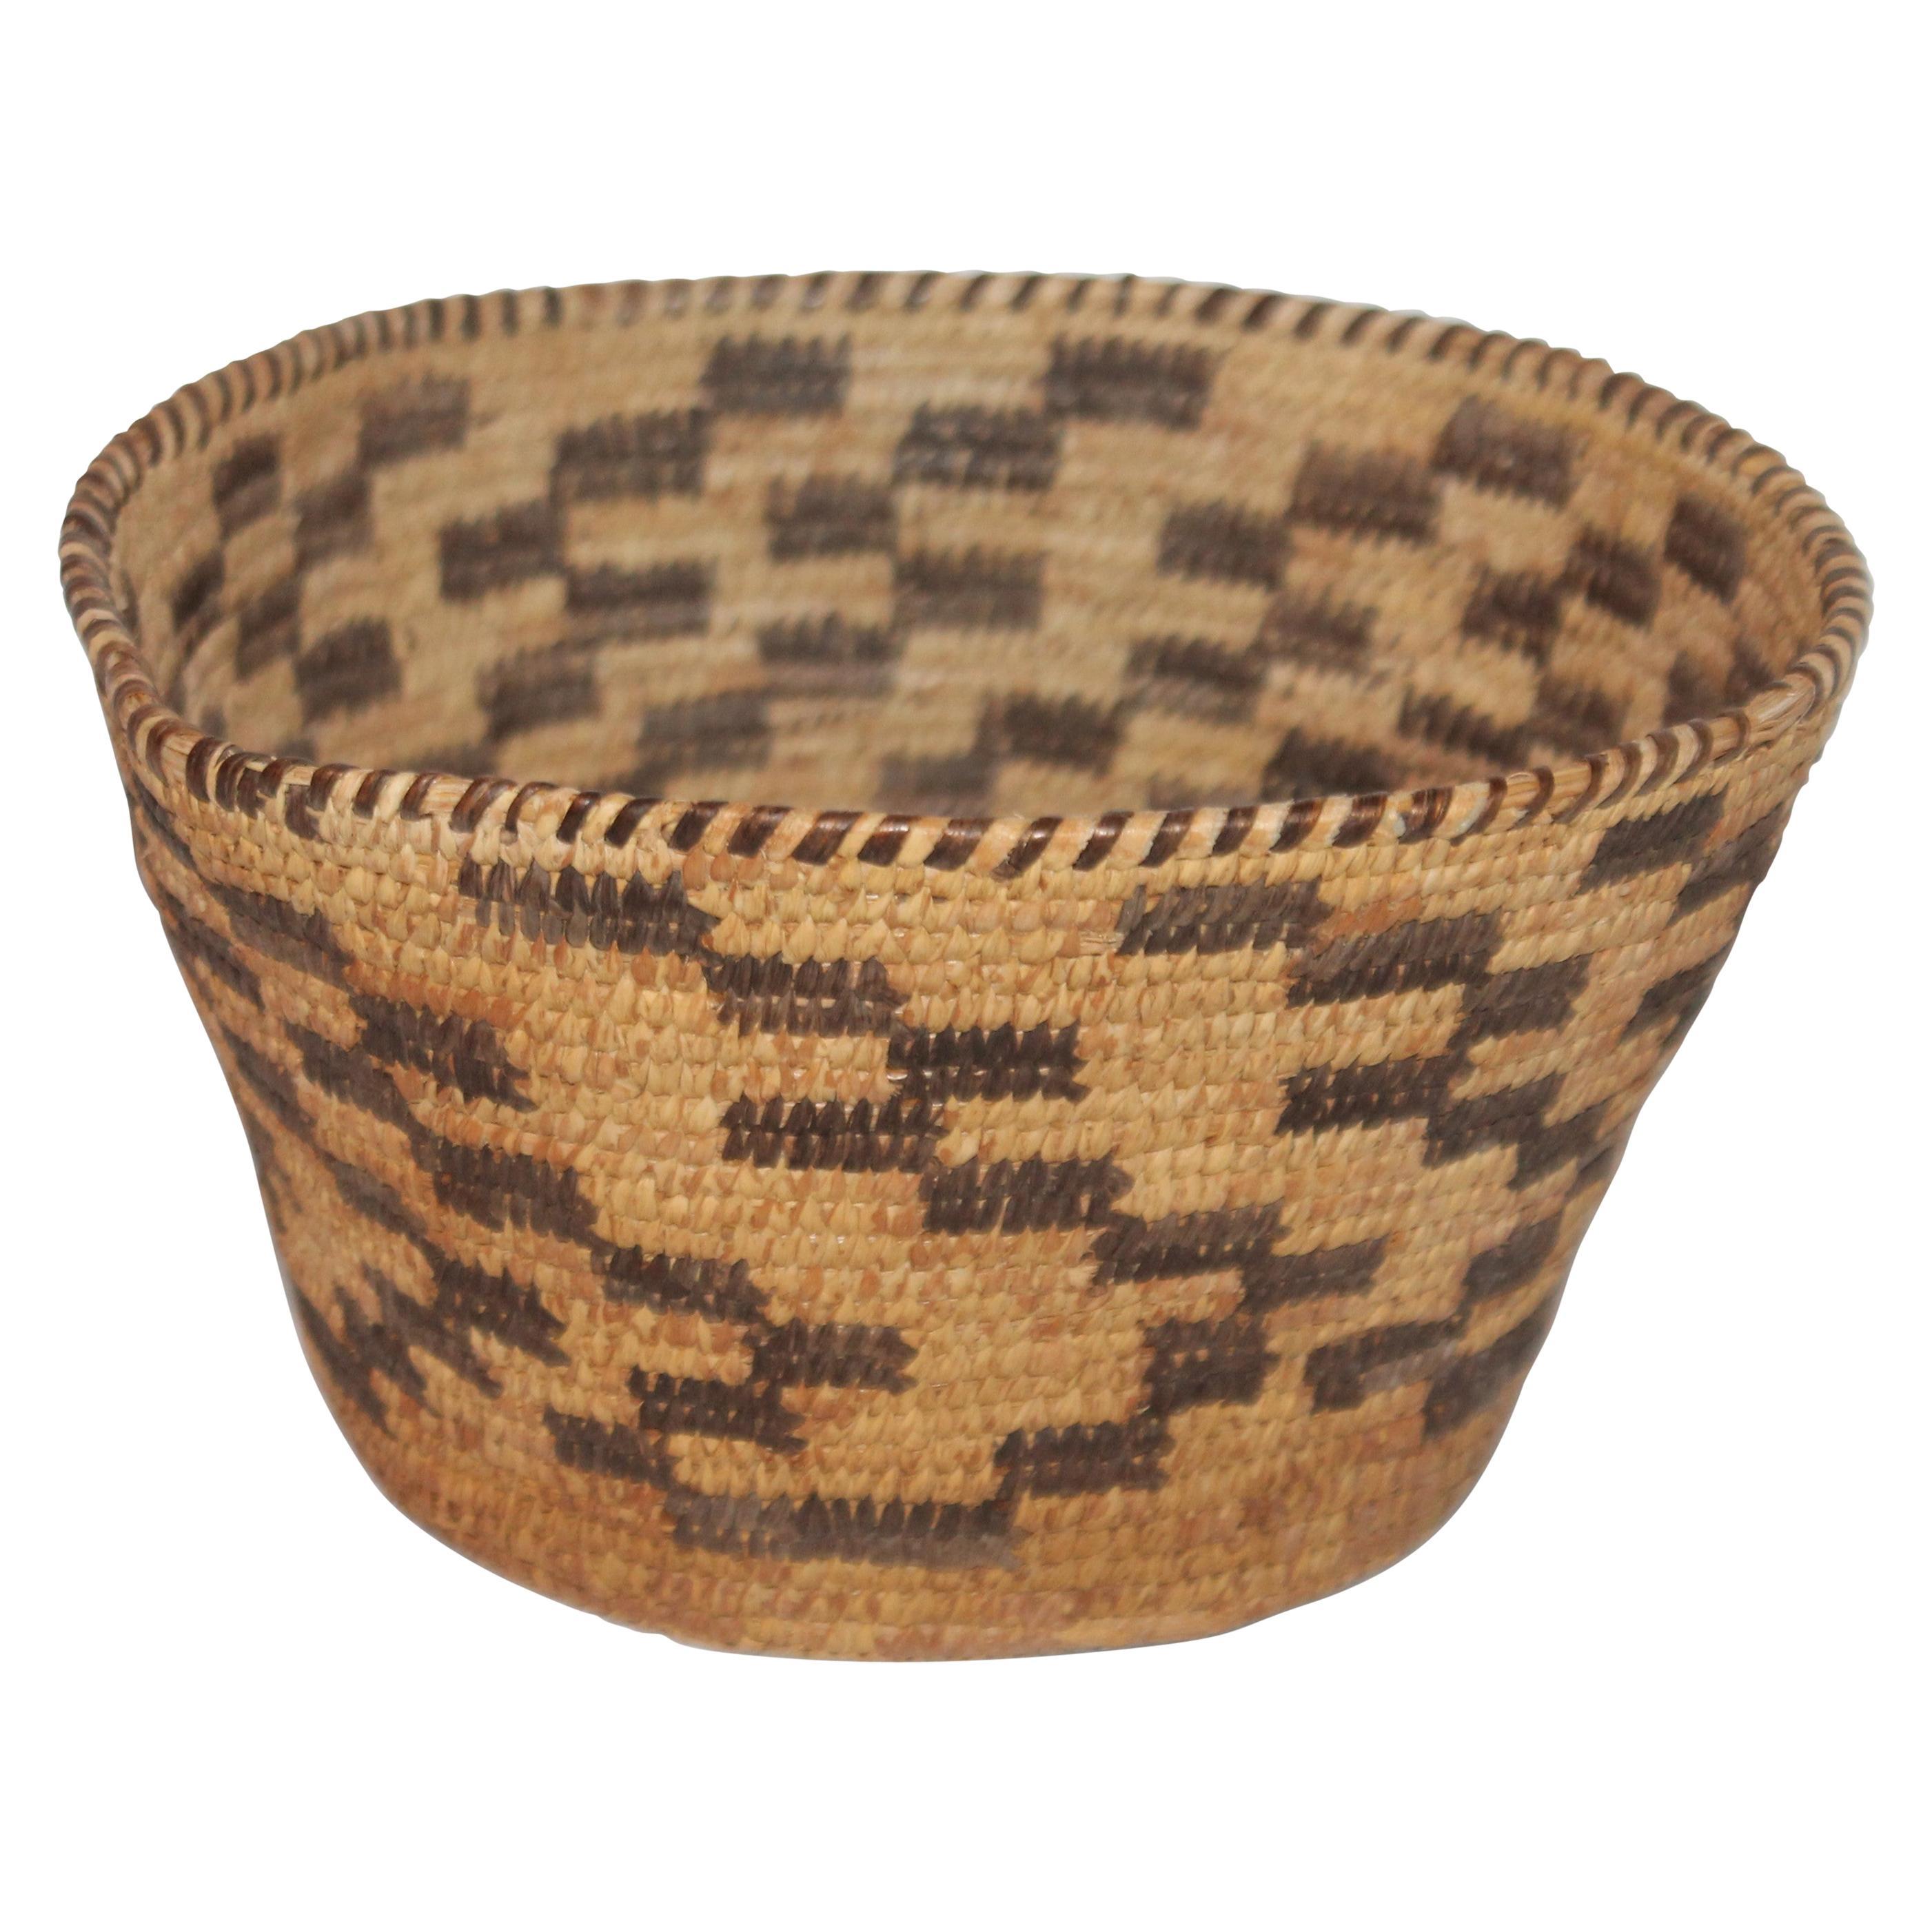 American Indian Pima Basket